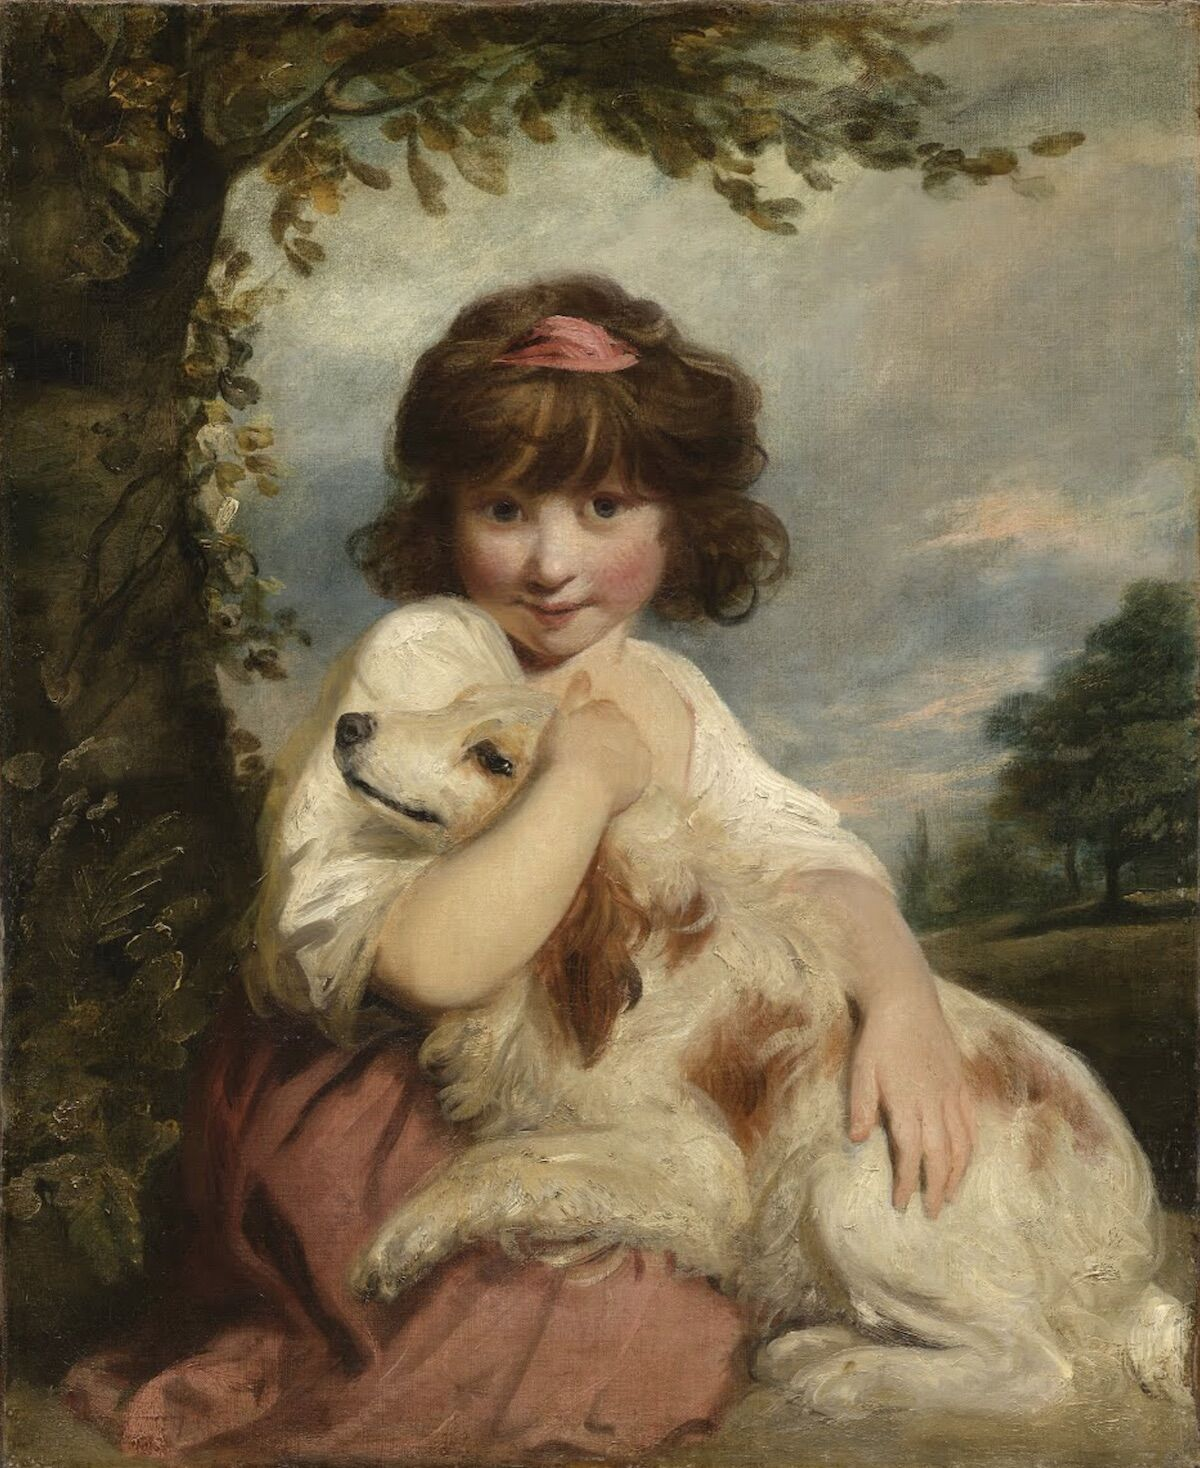 Joshua Reynolds, The portrait of Miss Mathew, later Lady Elizabeth Mathew, sitting with her dog before a landscape, 1780. Courtesy Art Recovery International.